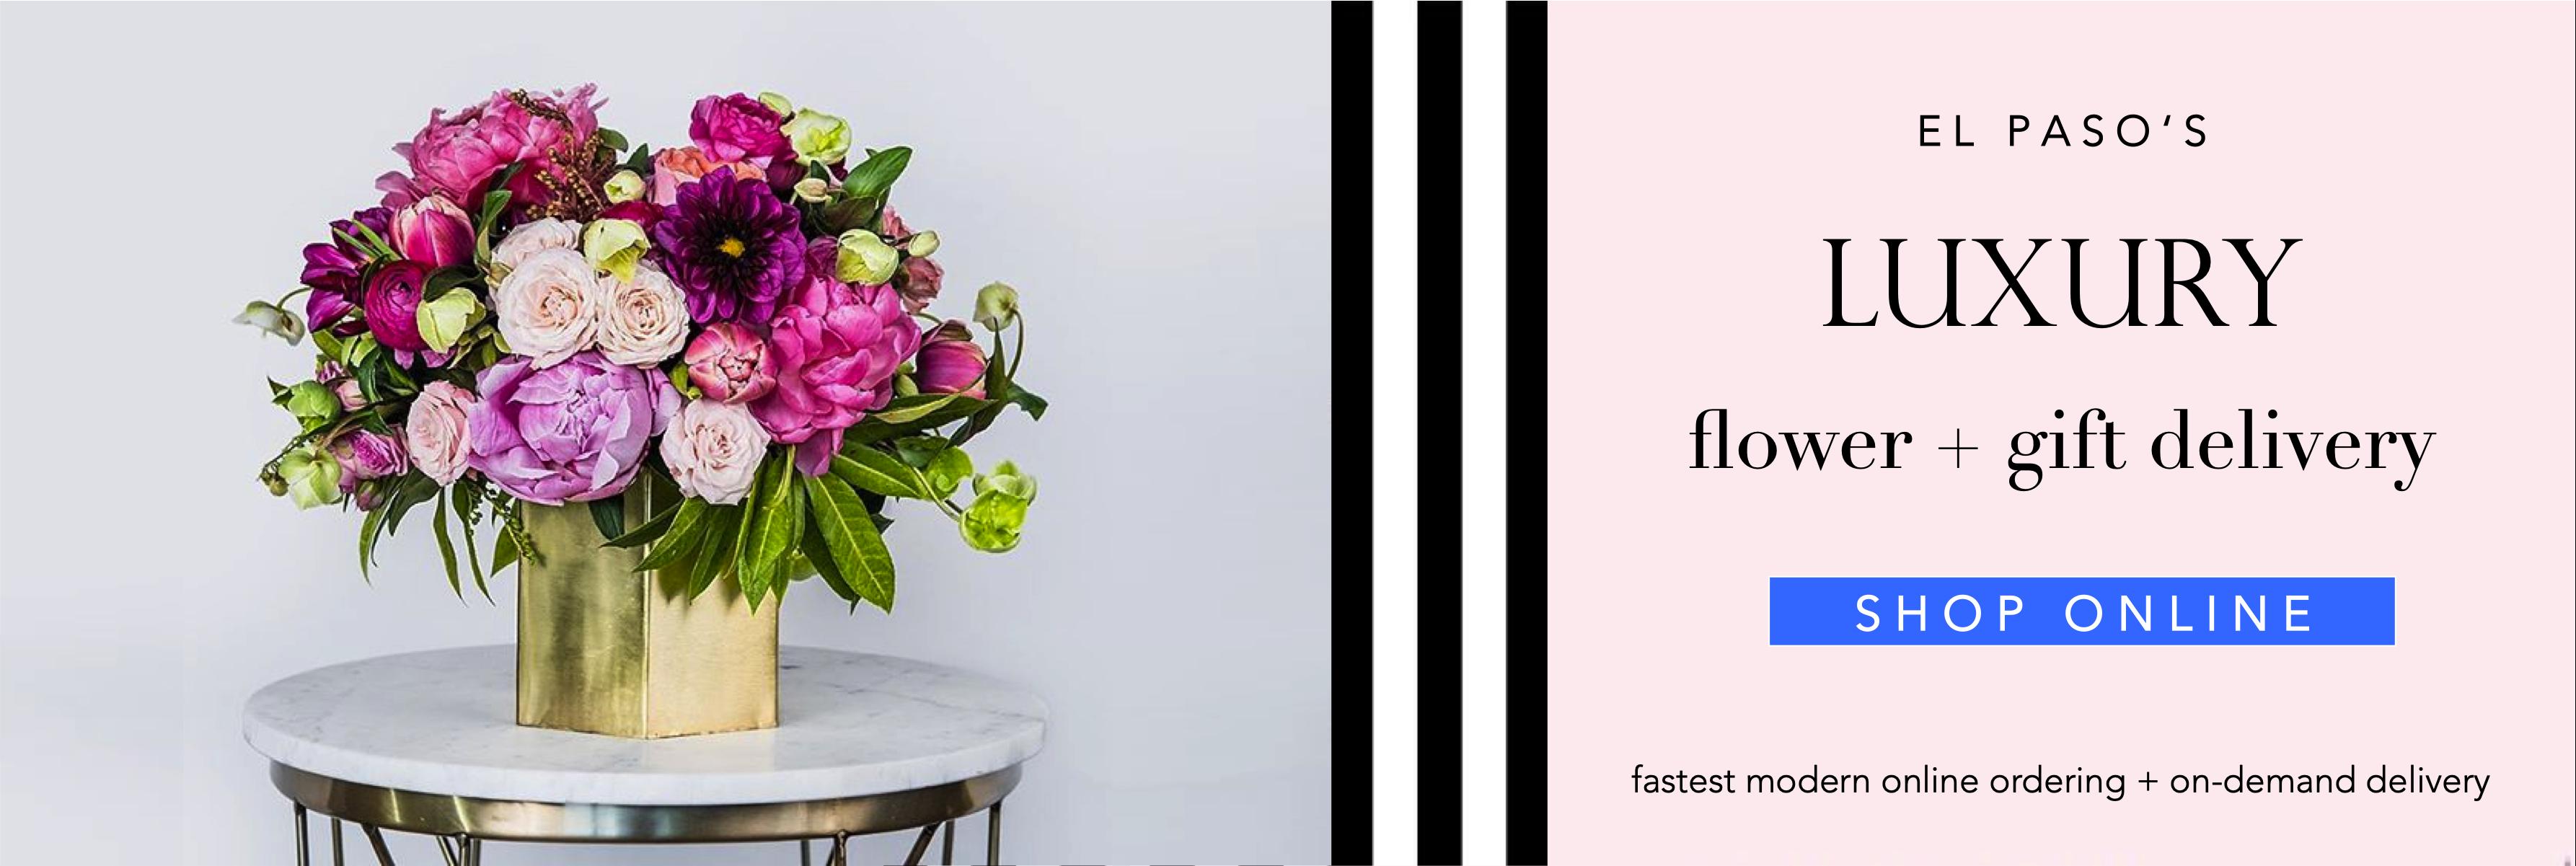 angies-floral-designs-eptx-el-paso-florist-el-paso-flowers-79912-el-paso-texas-el-paso-79912-angies-flower-florist-flower-delivery-flores-el-paso-floreria-bodas-events-weddings.png